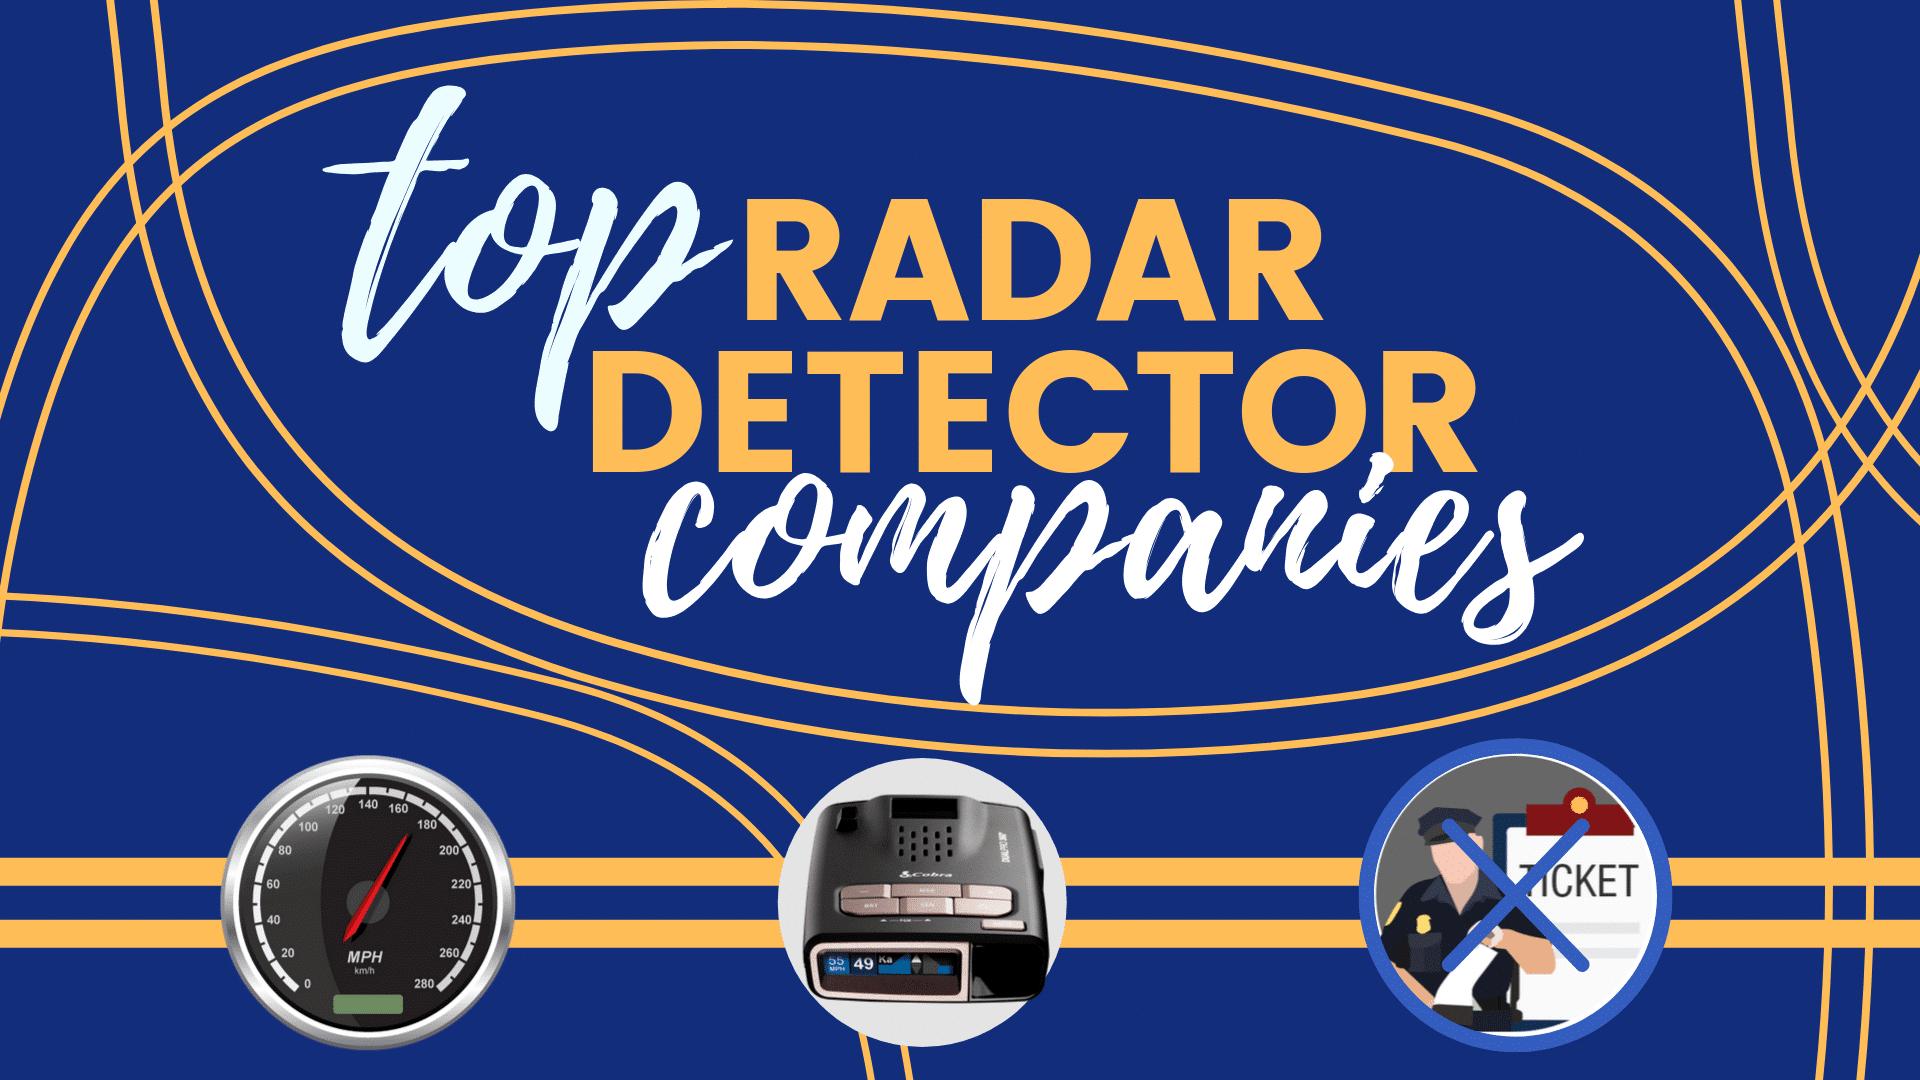 Top Radar Detector Companies